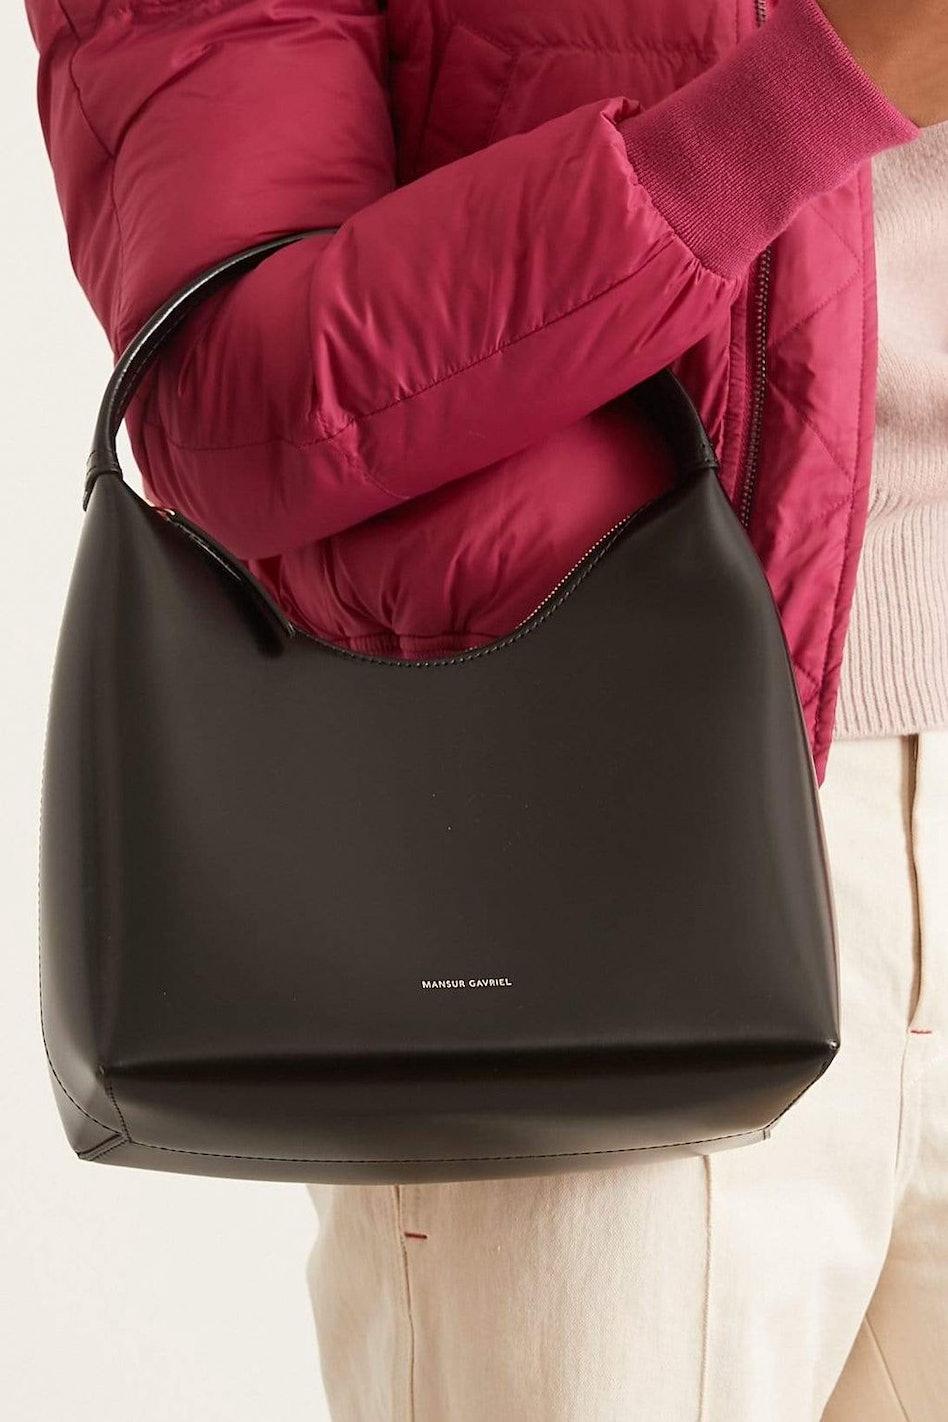 Zip Hobo Bag in Black/Flamma: additional image